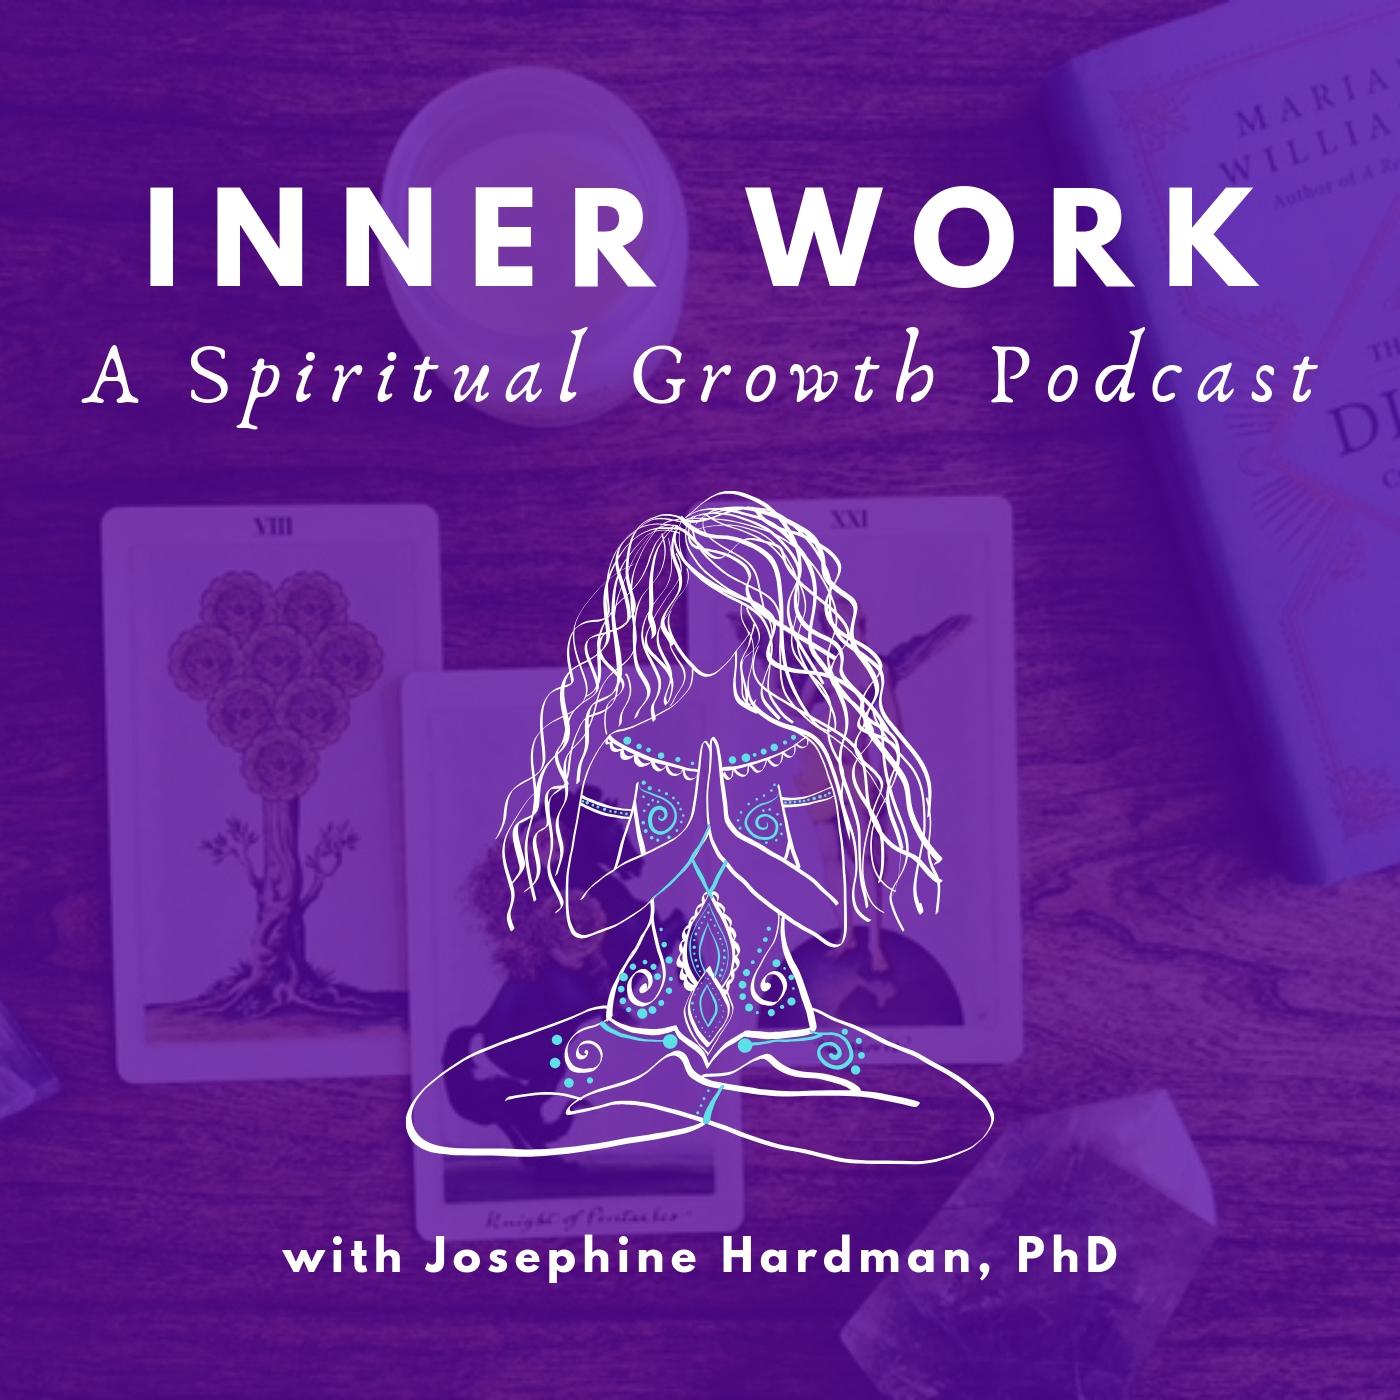 Inner Work: A Spiritual Growth Podcast